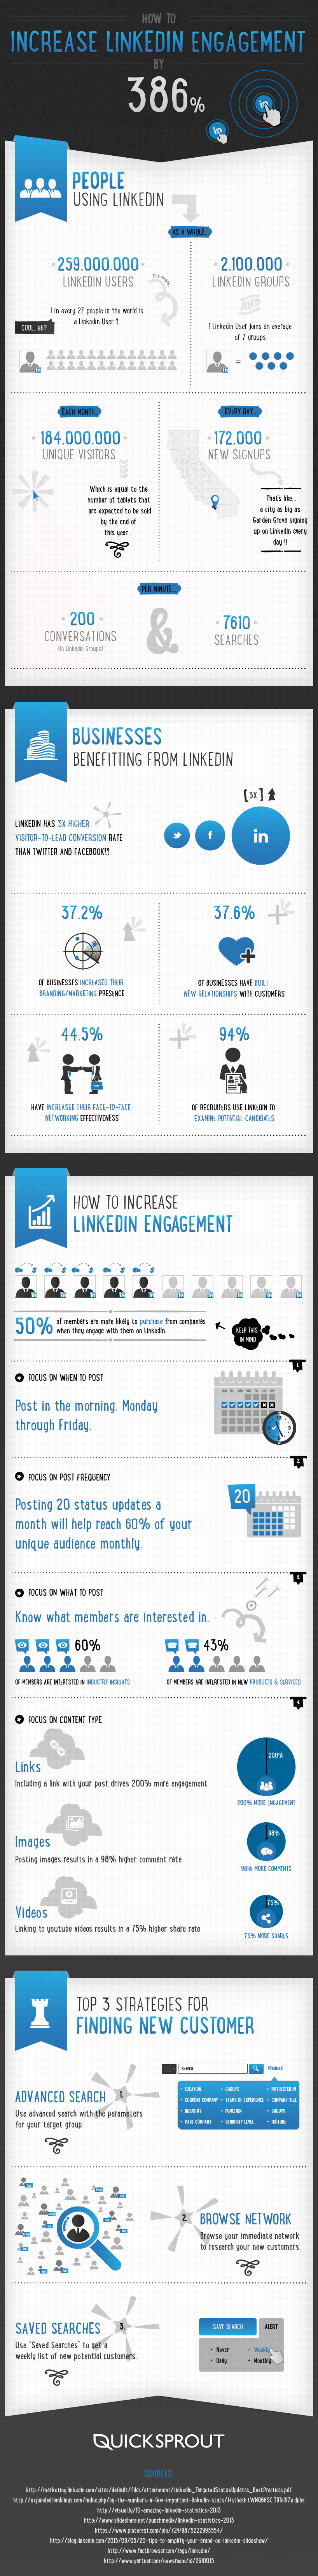 Tips til LinkedIn